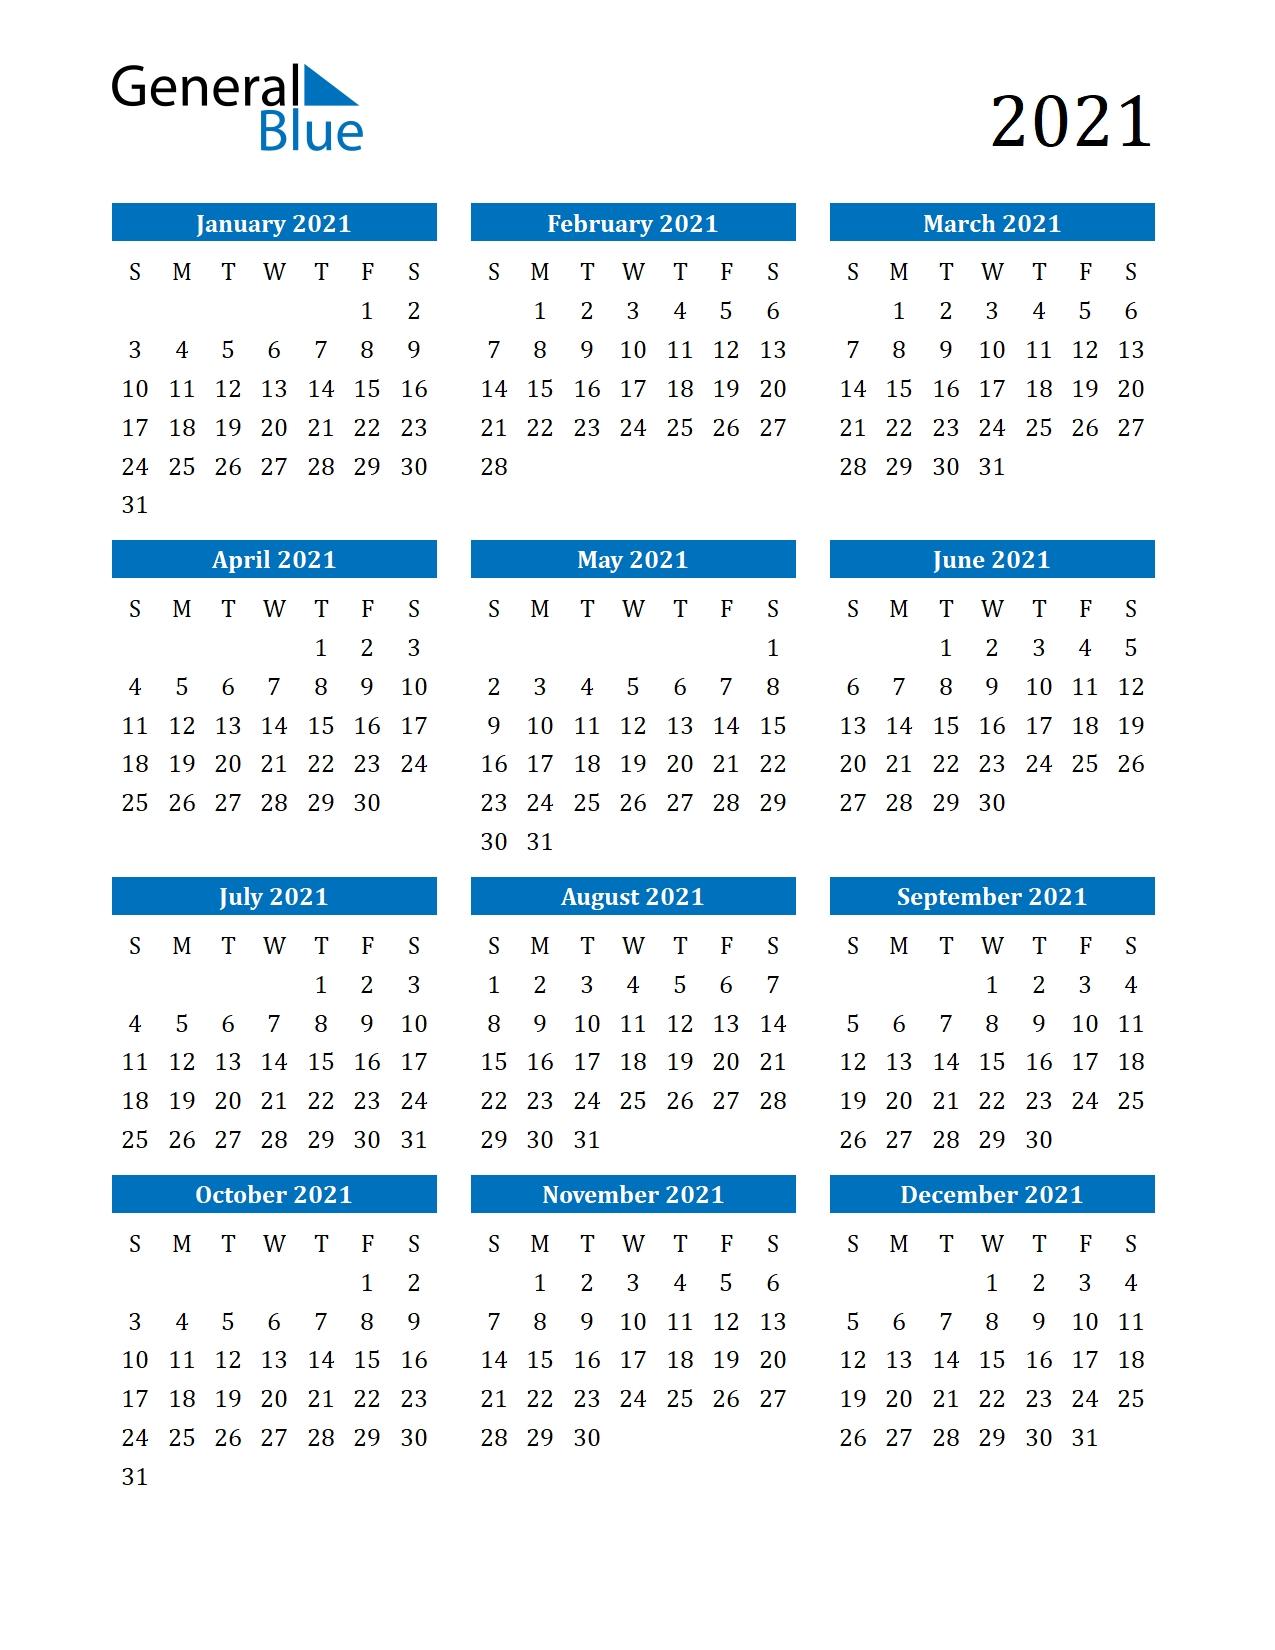 Catch Printable 2021 August Thru December Calander